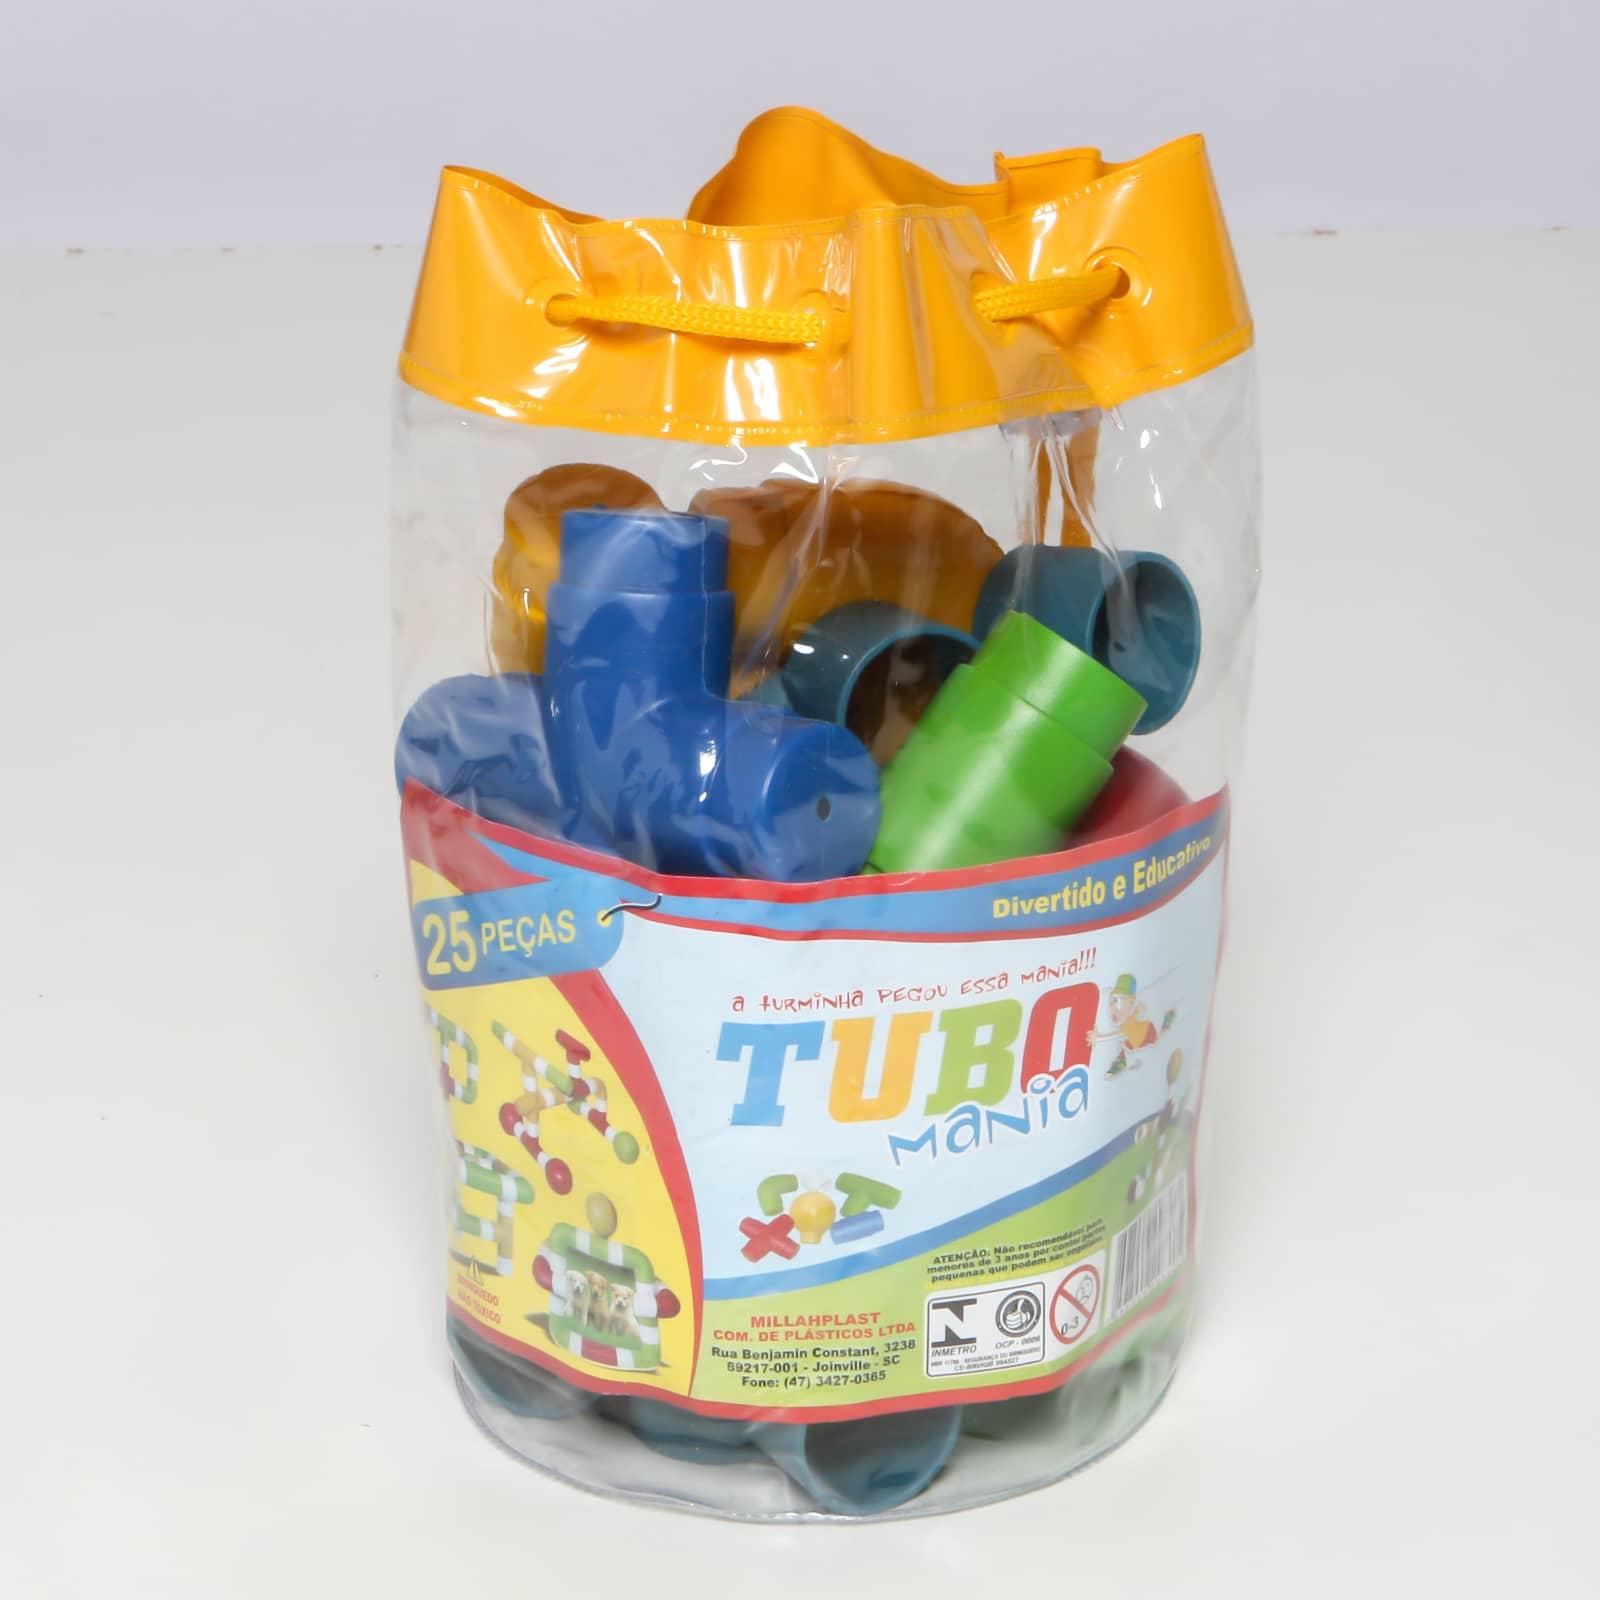 Tubo Mania 25 peças - Ref 030